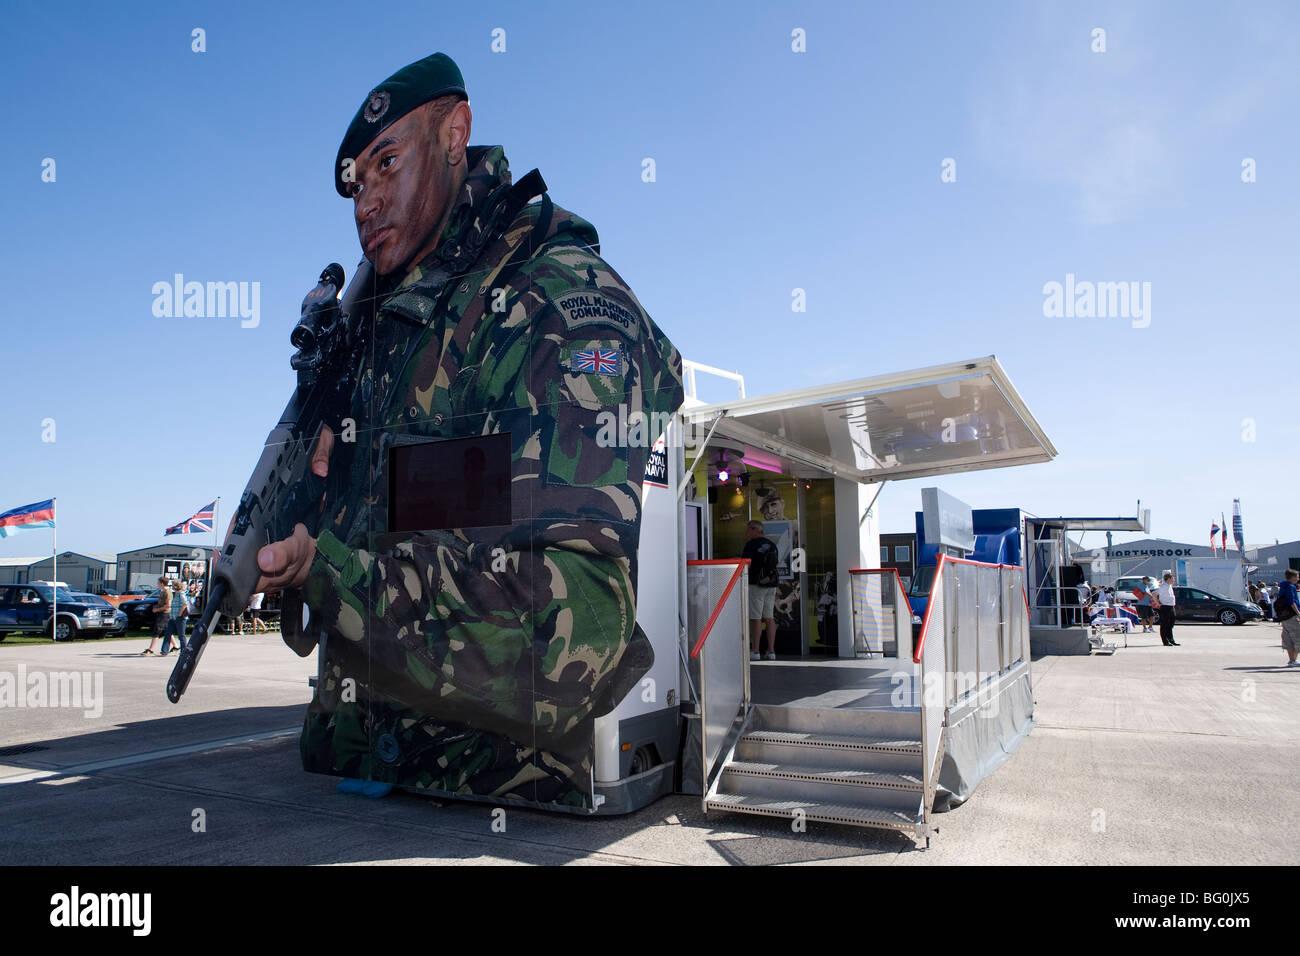 Large British Army recruitment billboard. Sussex, England. - Stock Image